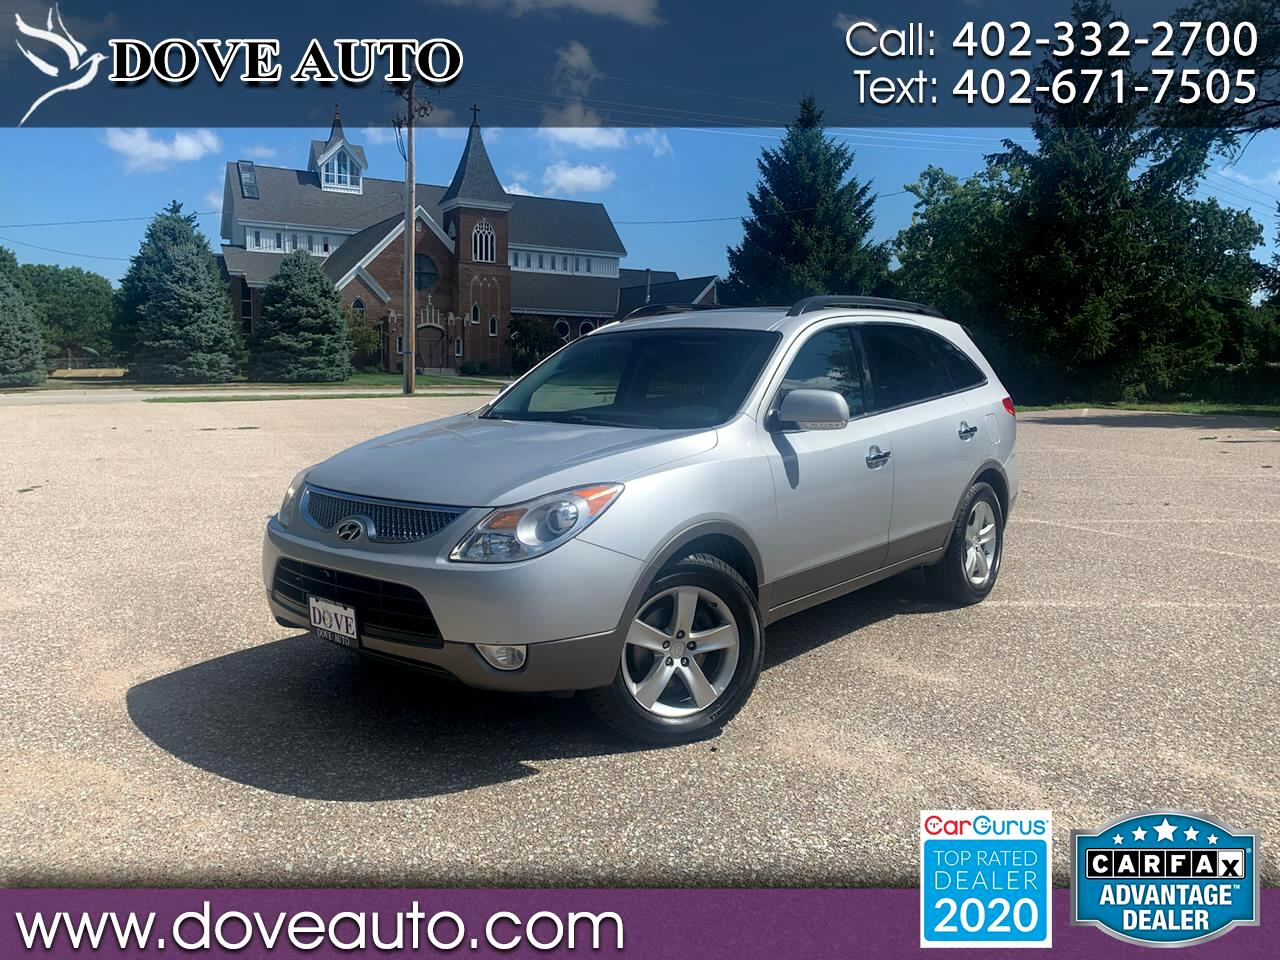 Hyundai Veracruz AWD 4dr Limited 2008